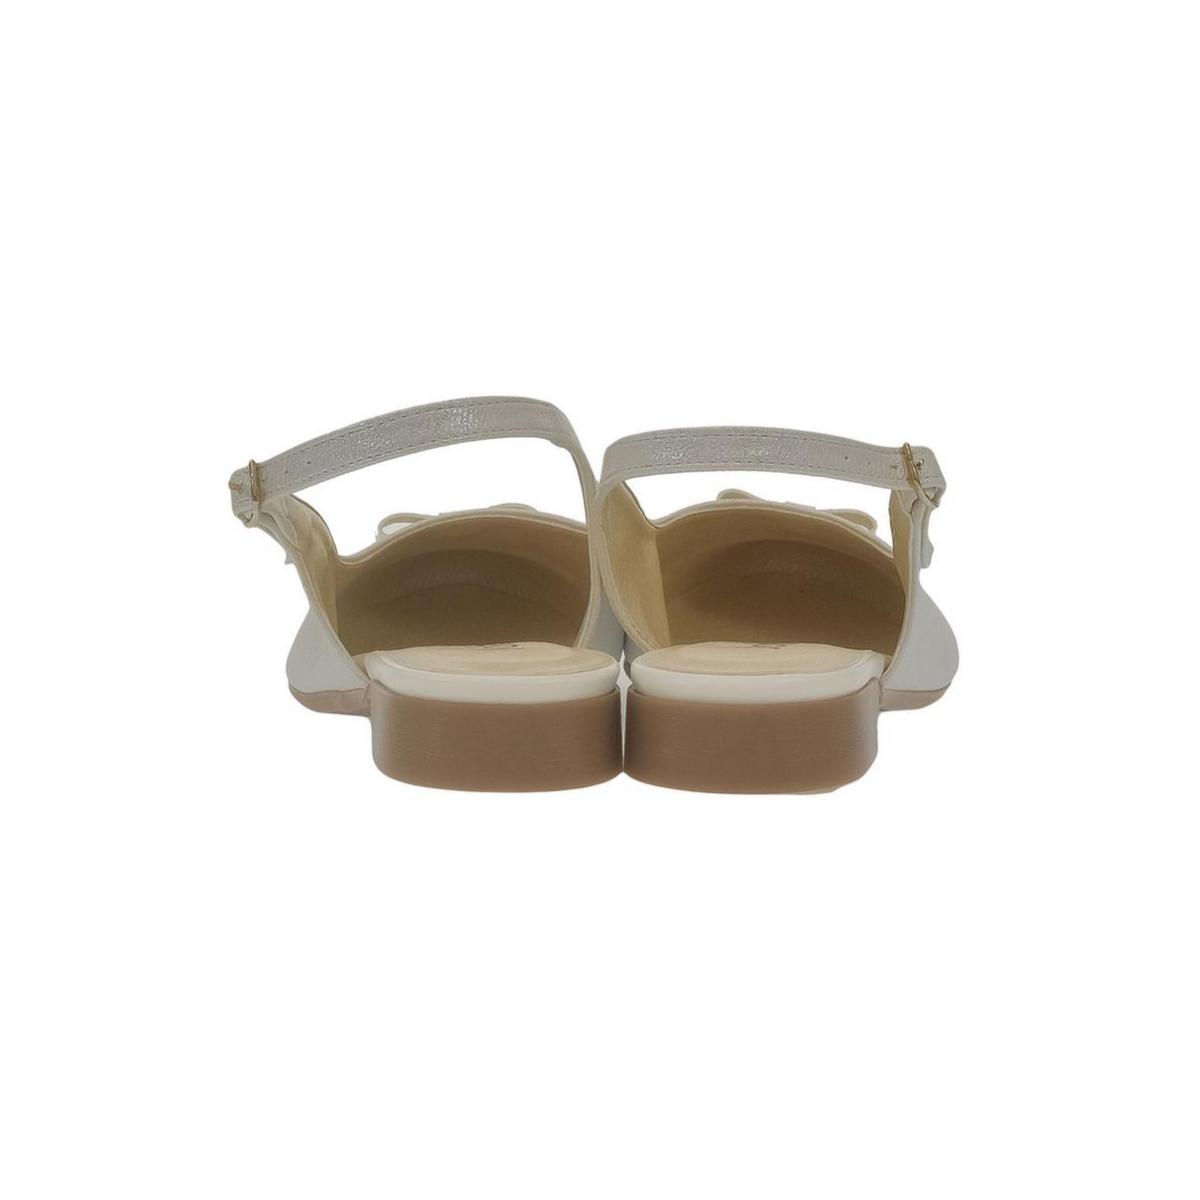 c92f6e72ee13 Dámske biele sandále EVELINE - 2